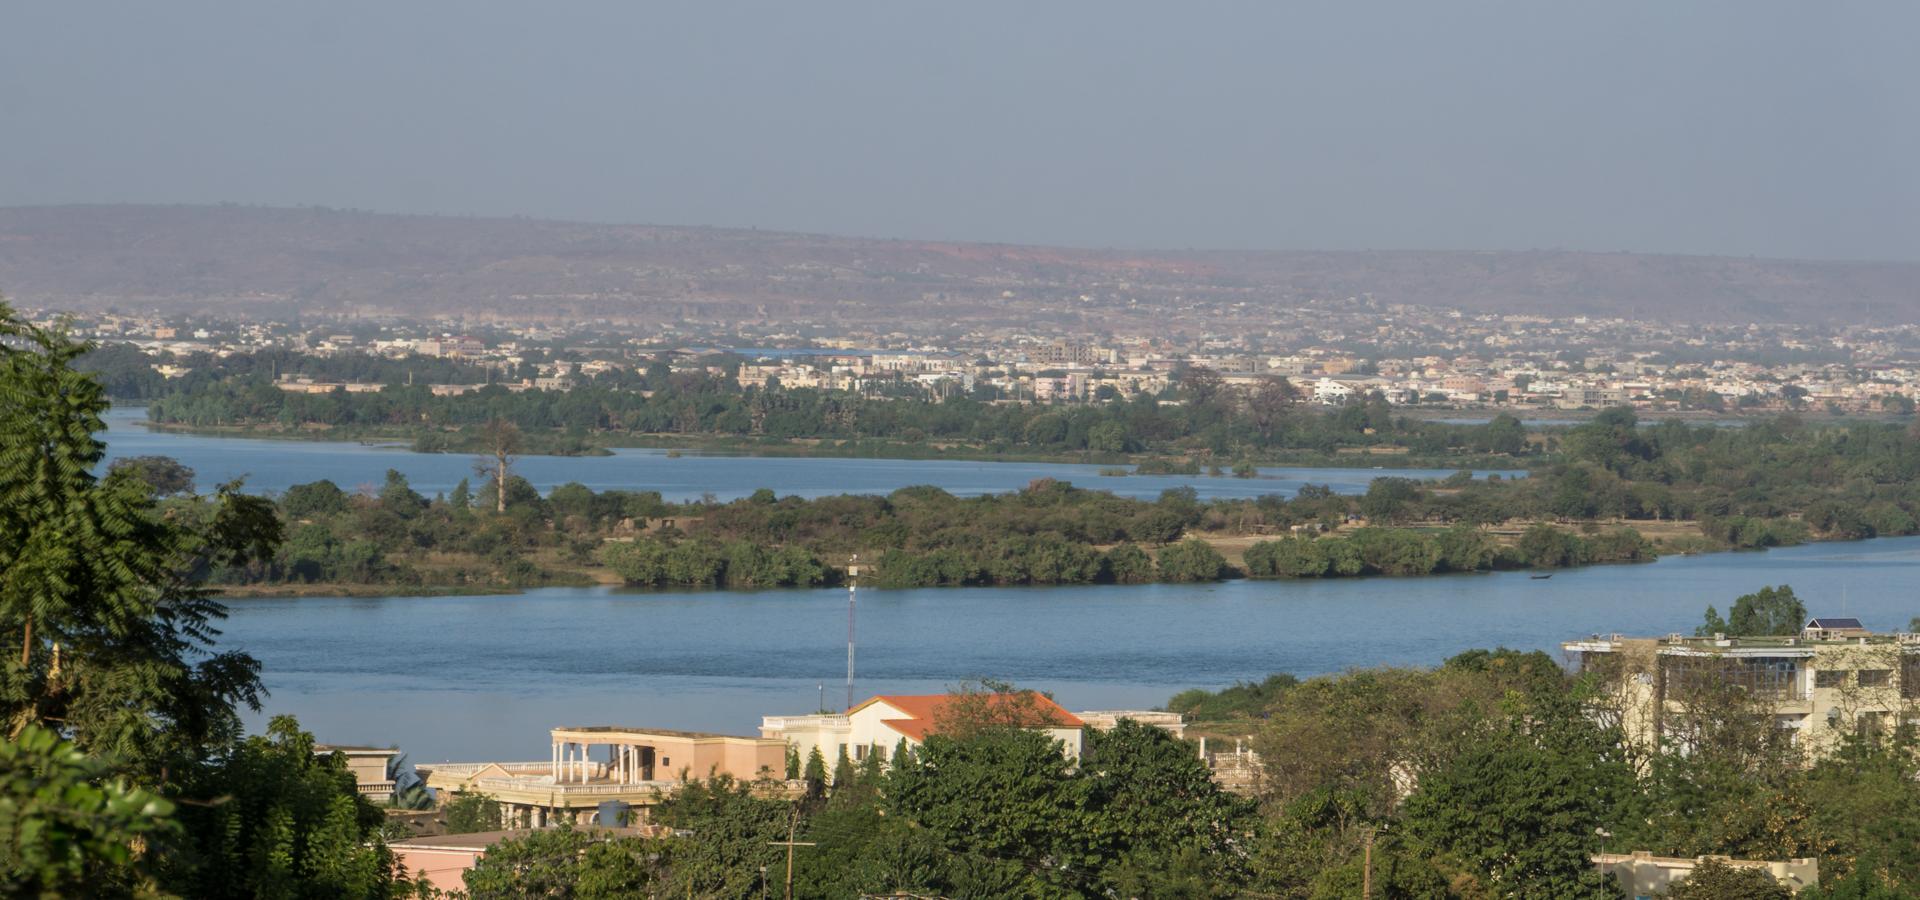 Peer-to-peer advisory in Bamako, Mali